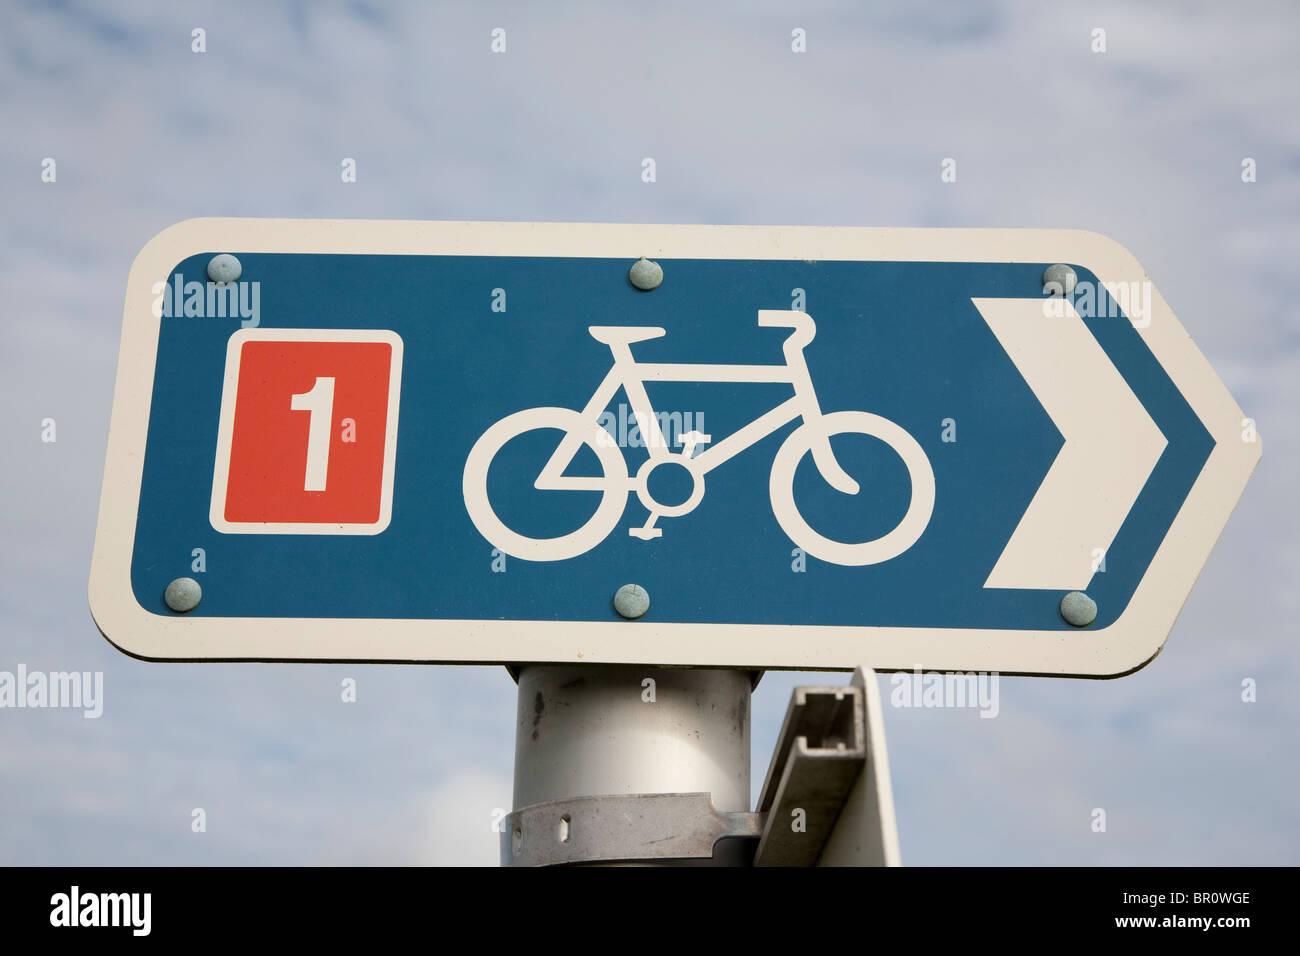 Red de ciclo ruta nacional número 1 Imagen De Stock